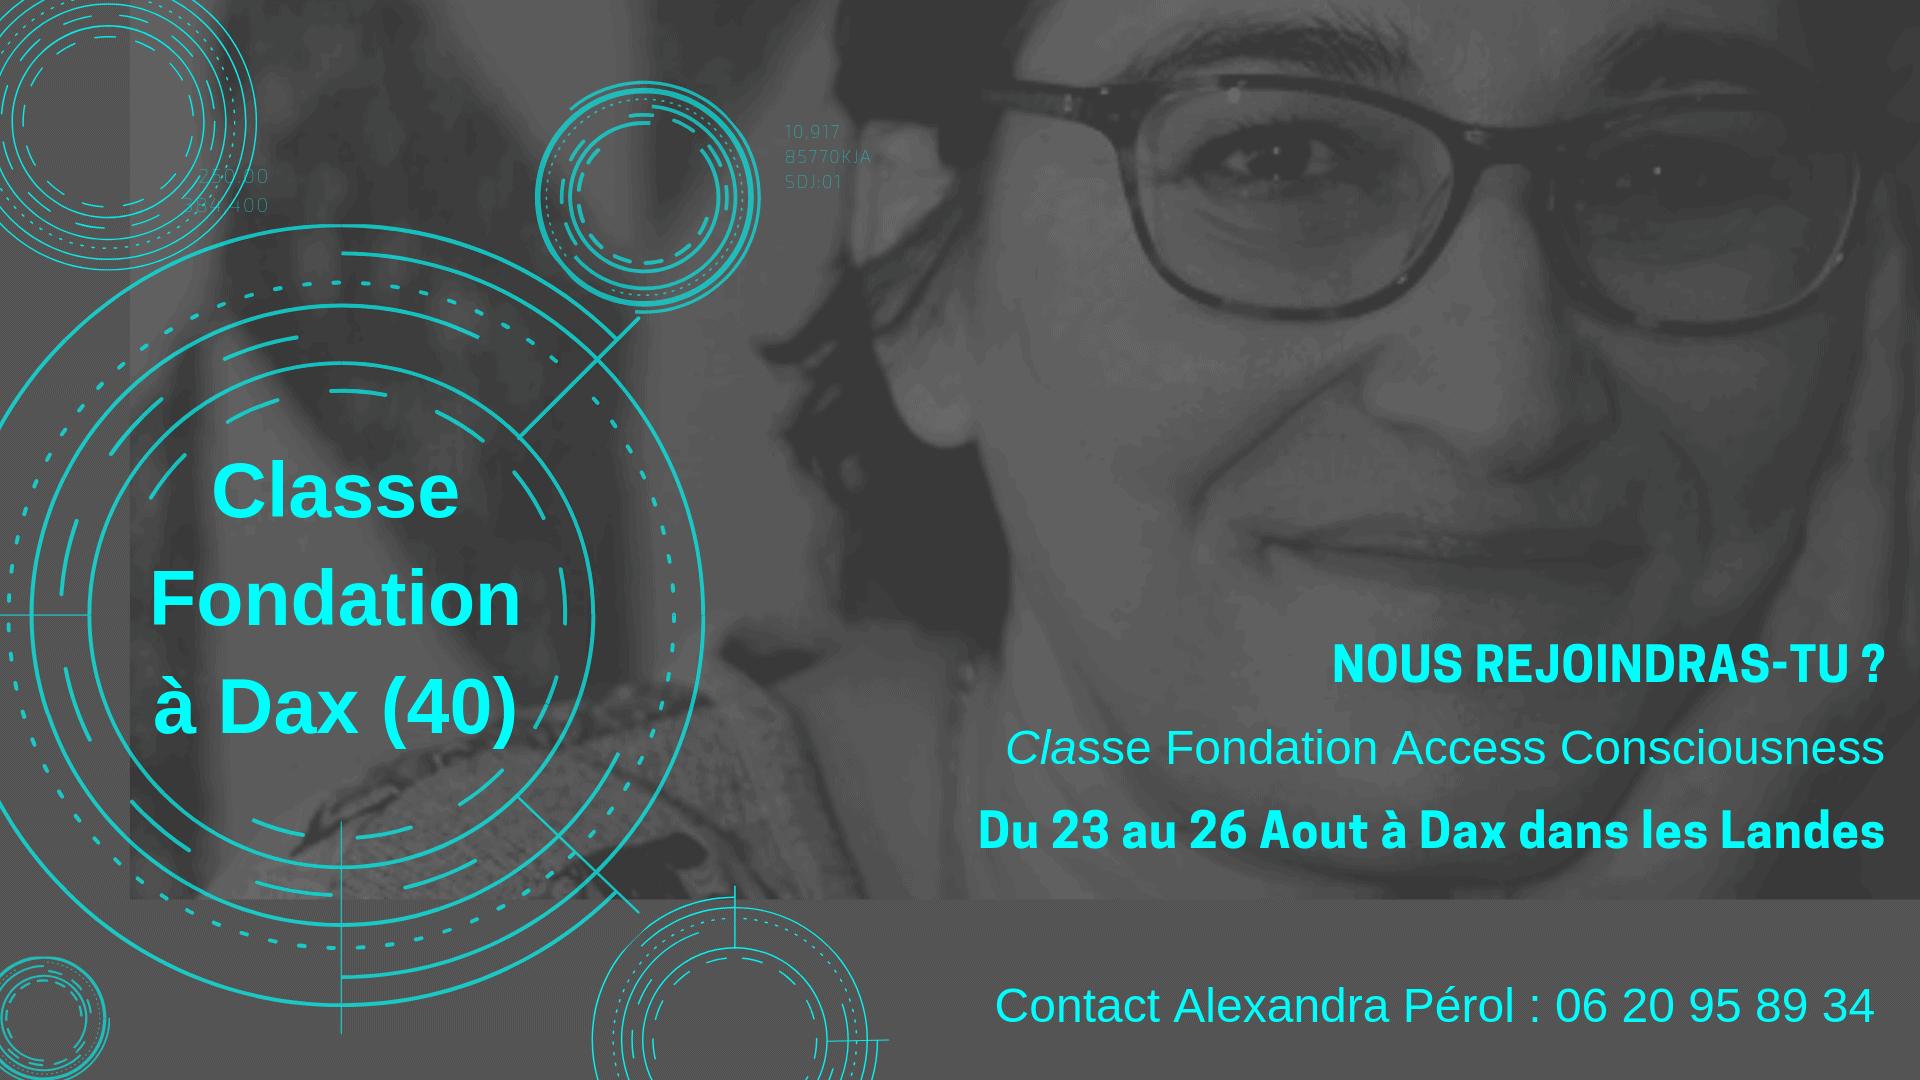 Classe Fondation Access Consciousness à Dax avec Alexandra Perol du 23 au 26 Août 2019